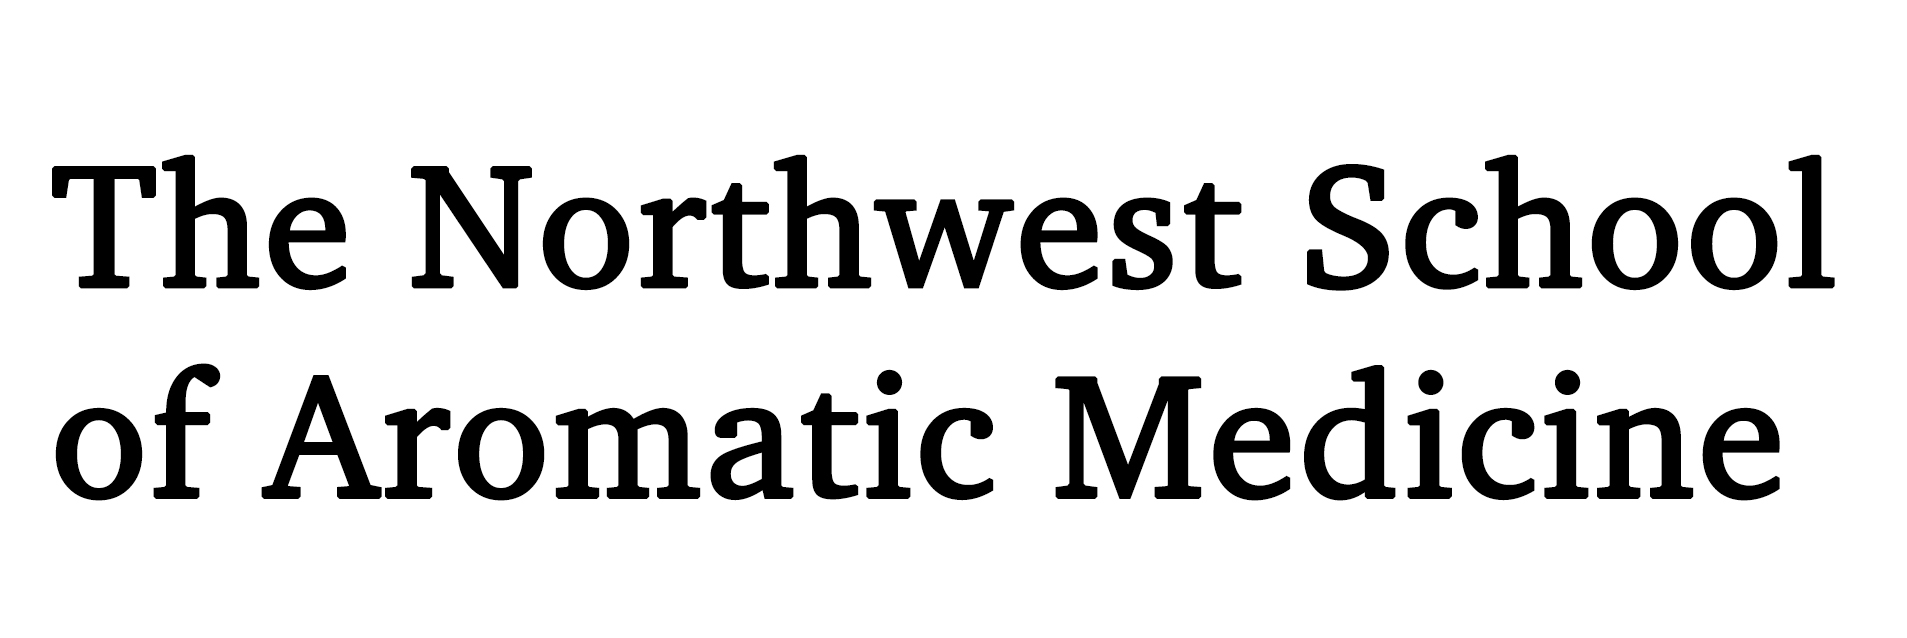 The Northwest School of Aromatic Medicine